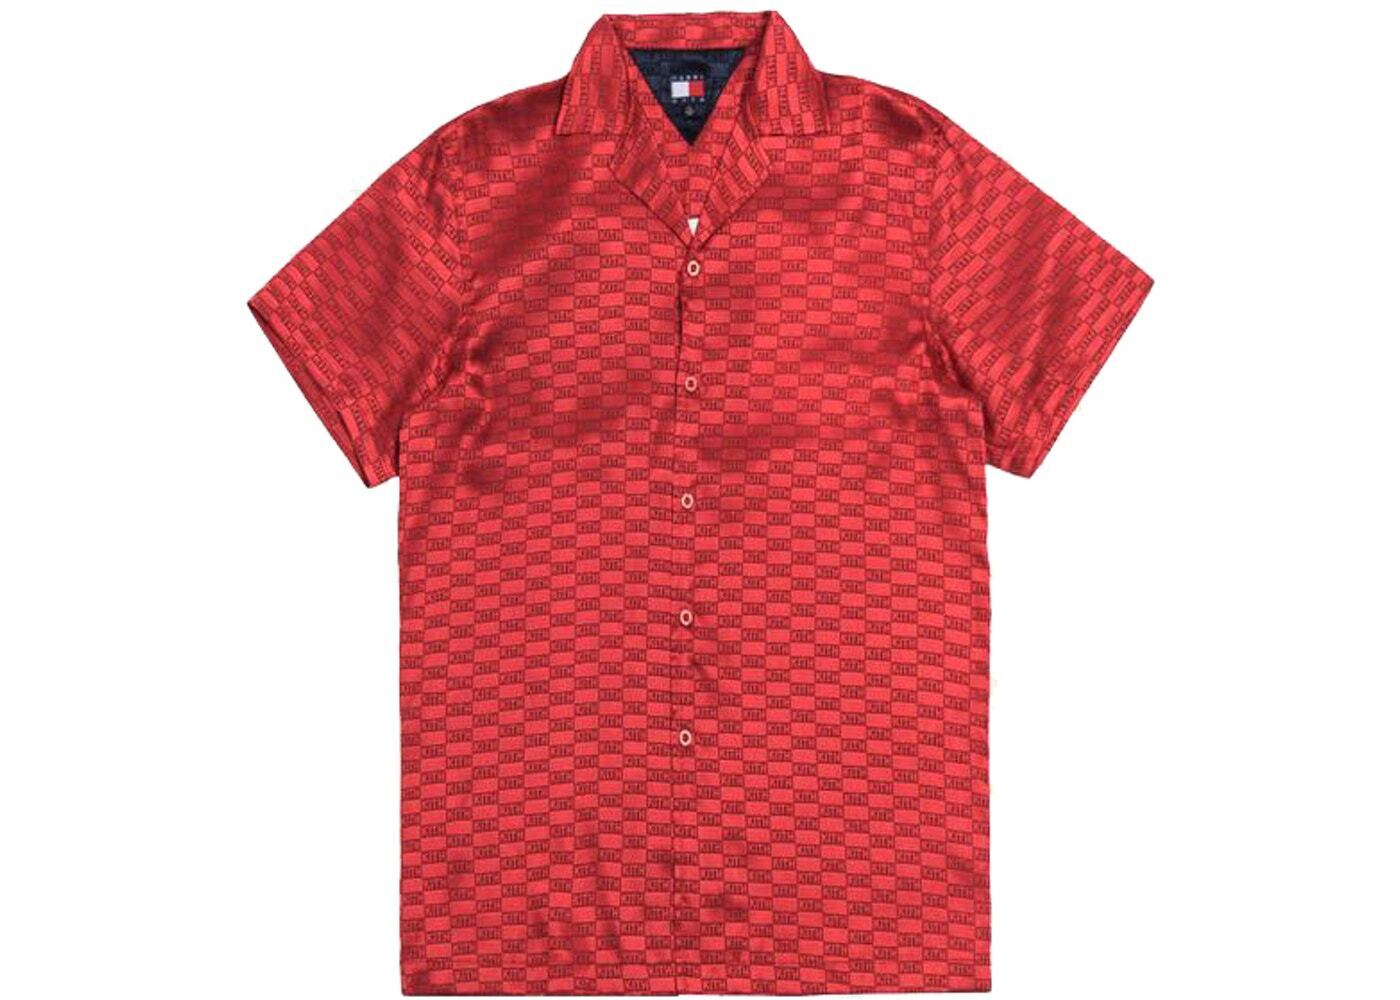 Kith x Tommy Hilfiger Satin Camp Shirt Redの写真